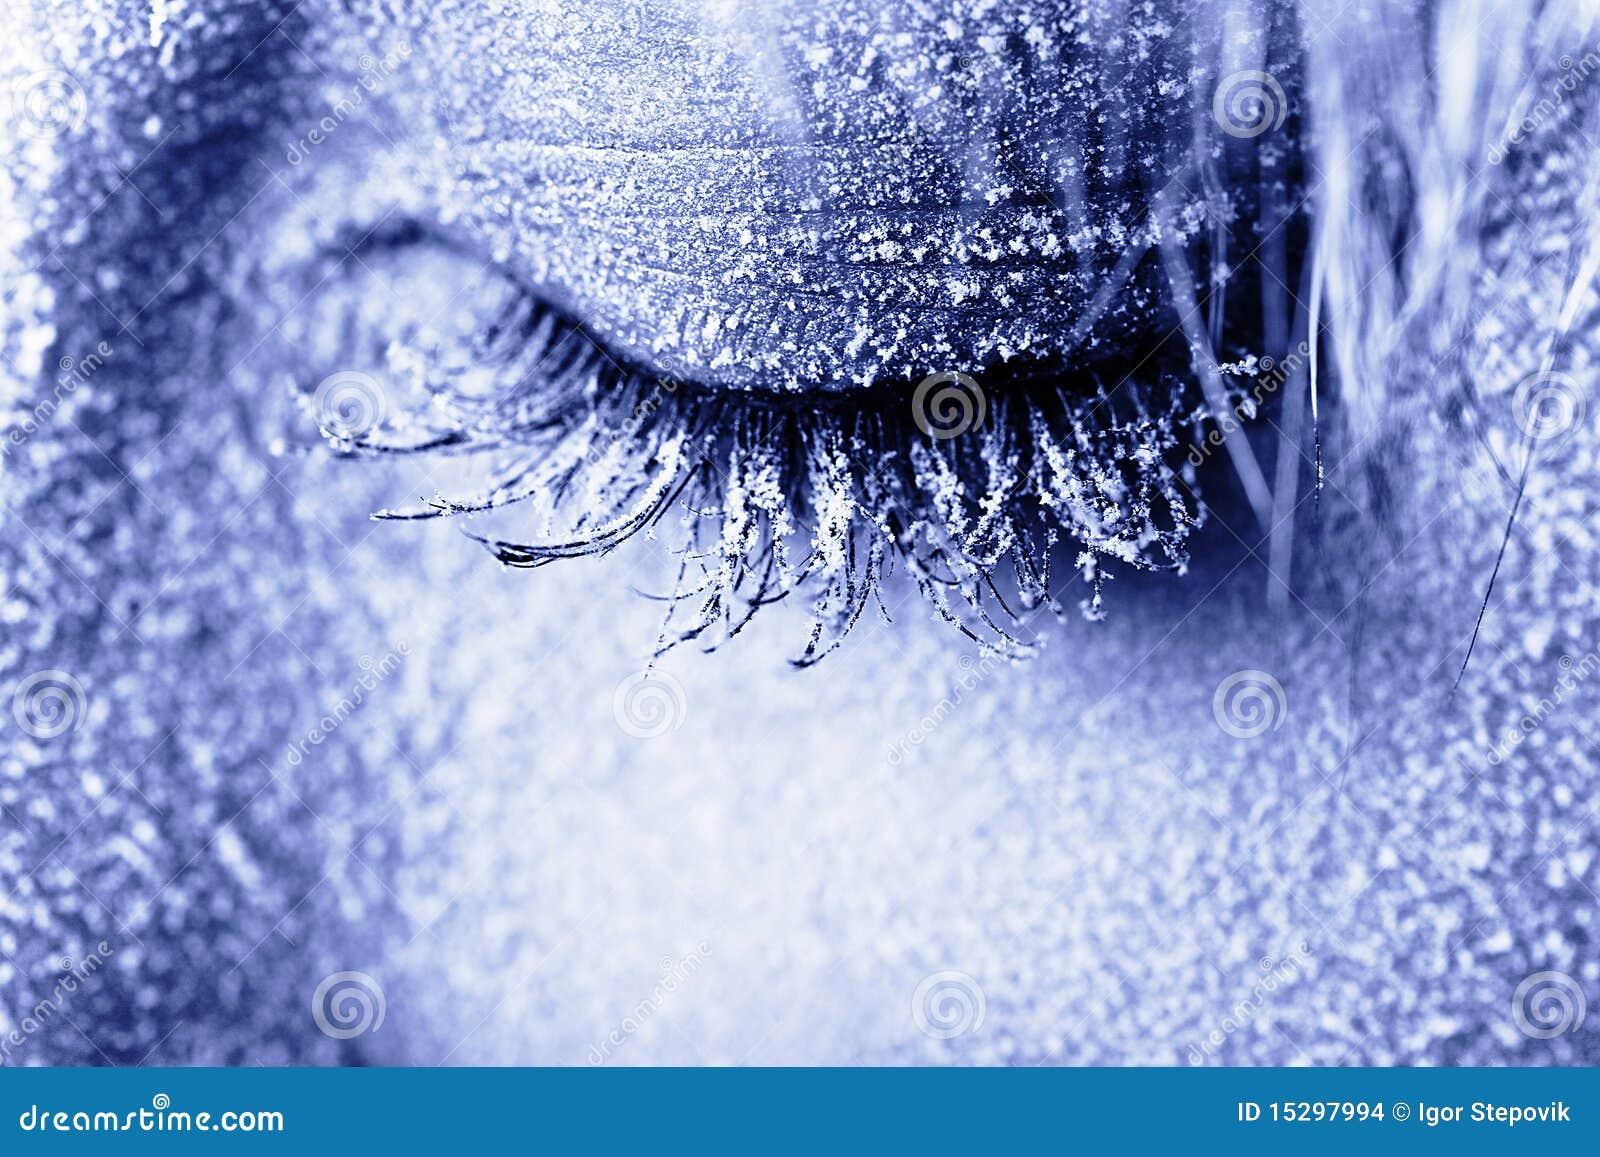 Frozen woman s eye covered in frost